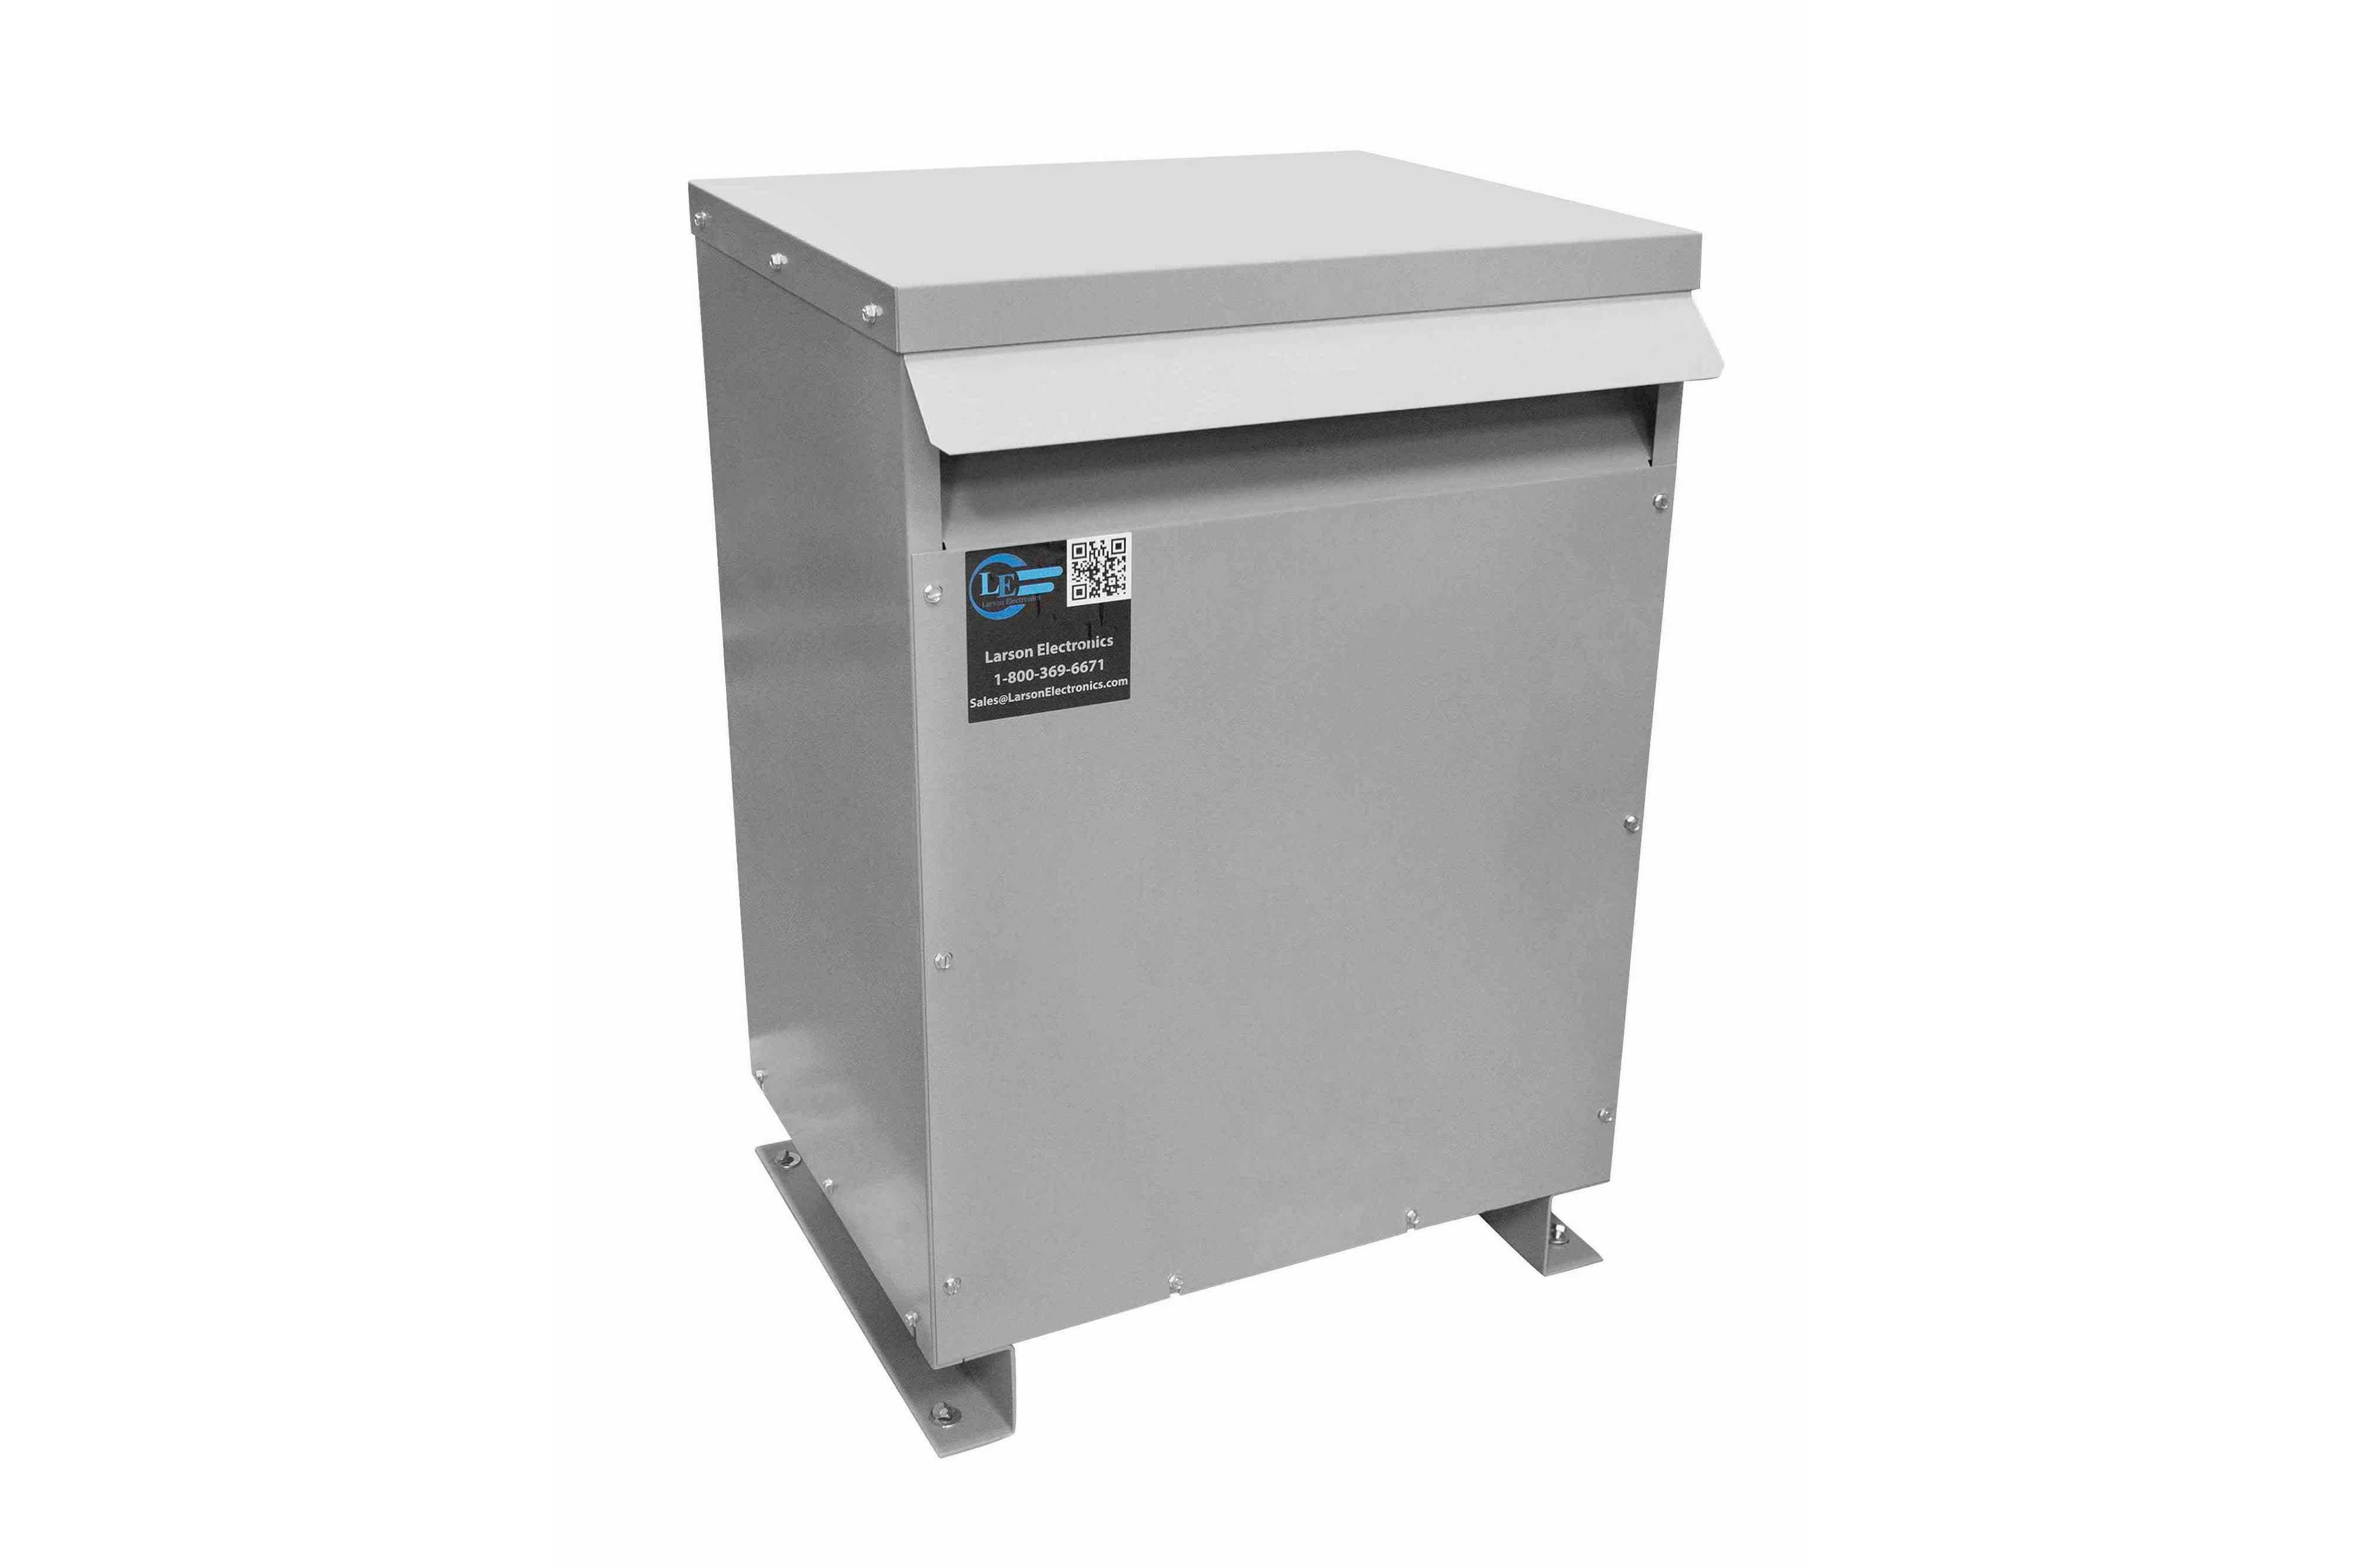 200 kVA 3PH Isolation Transformer, 380V Wye Primary, 240V/120 Delta Secondary, N3R, Ventilated, 60 Hz